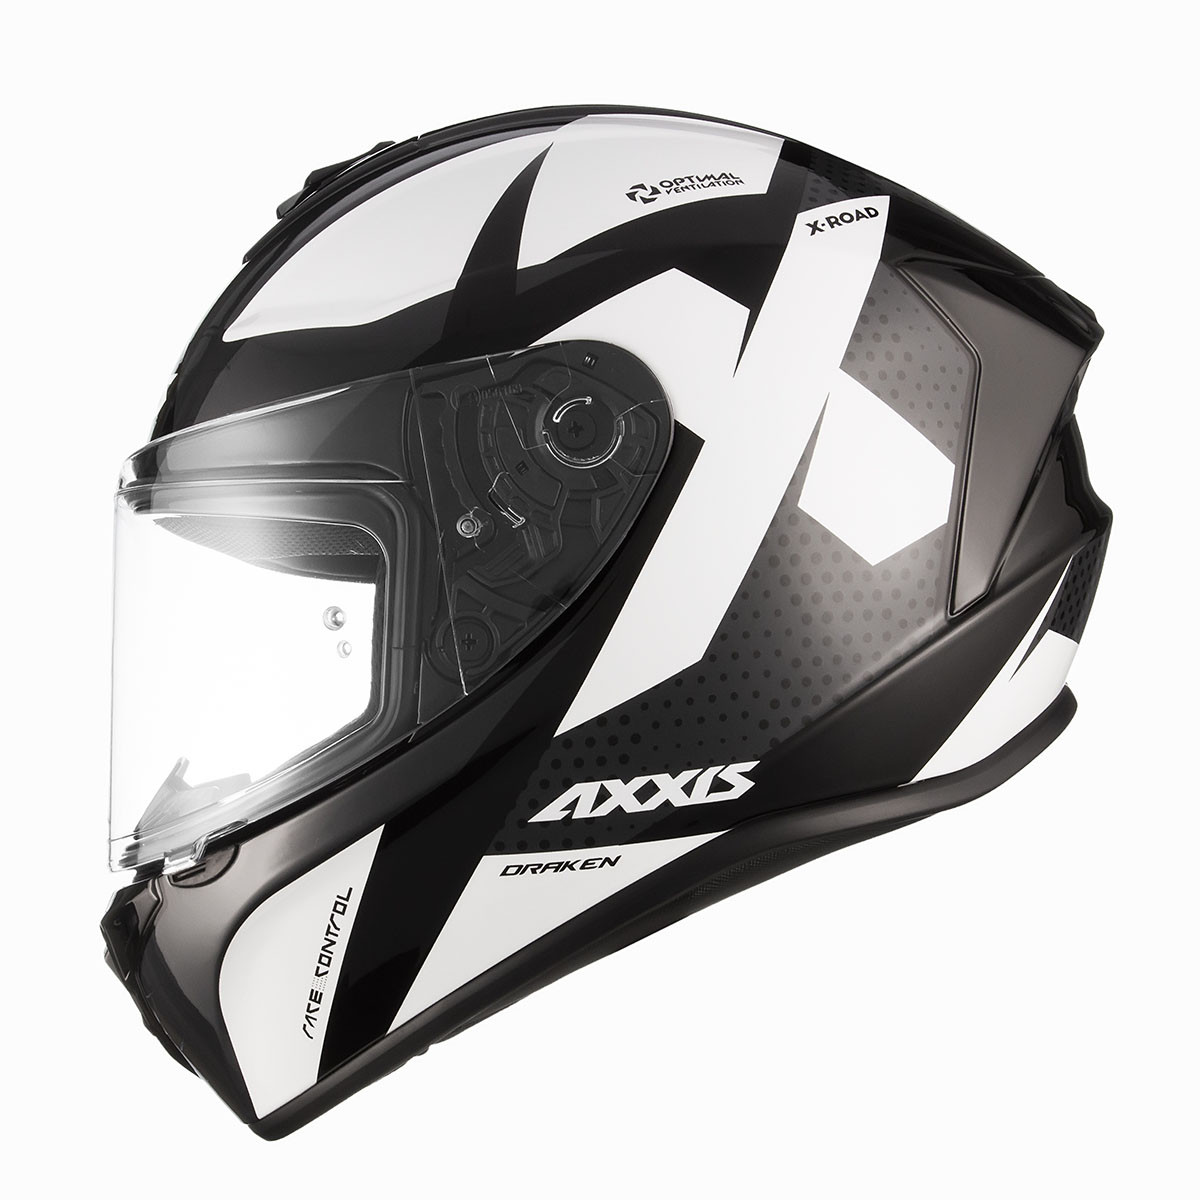 Casco Integral Axxis Draken X-road B6 Negro